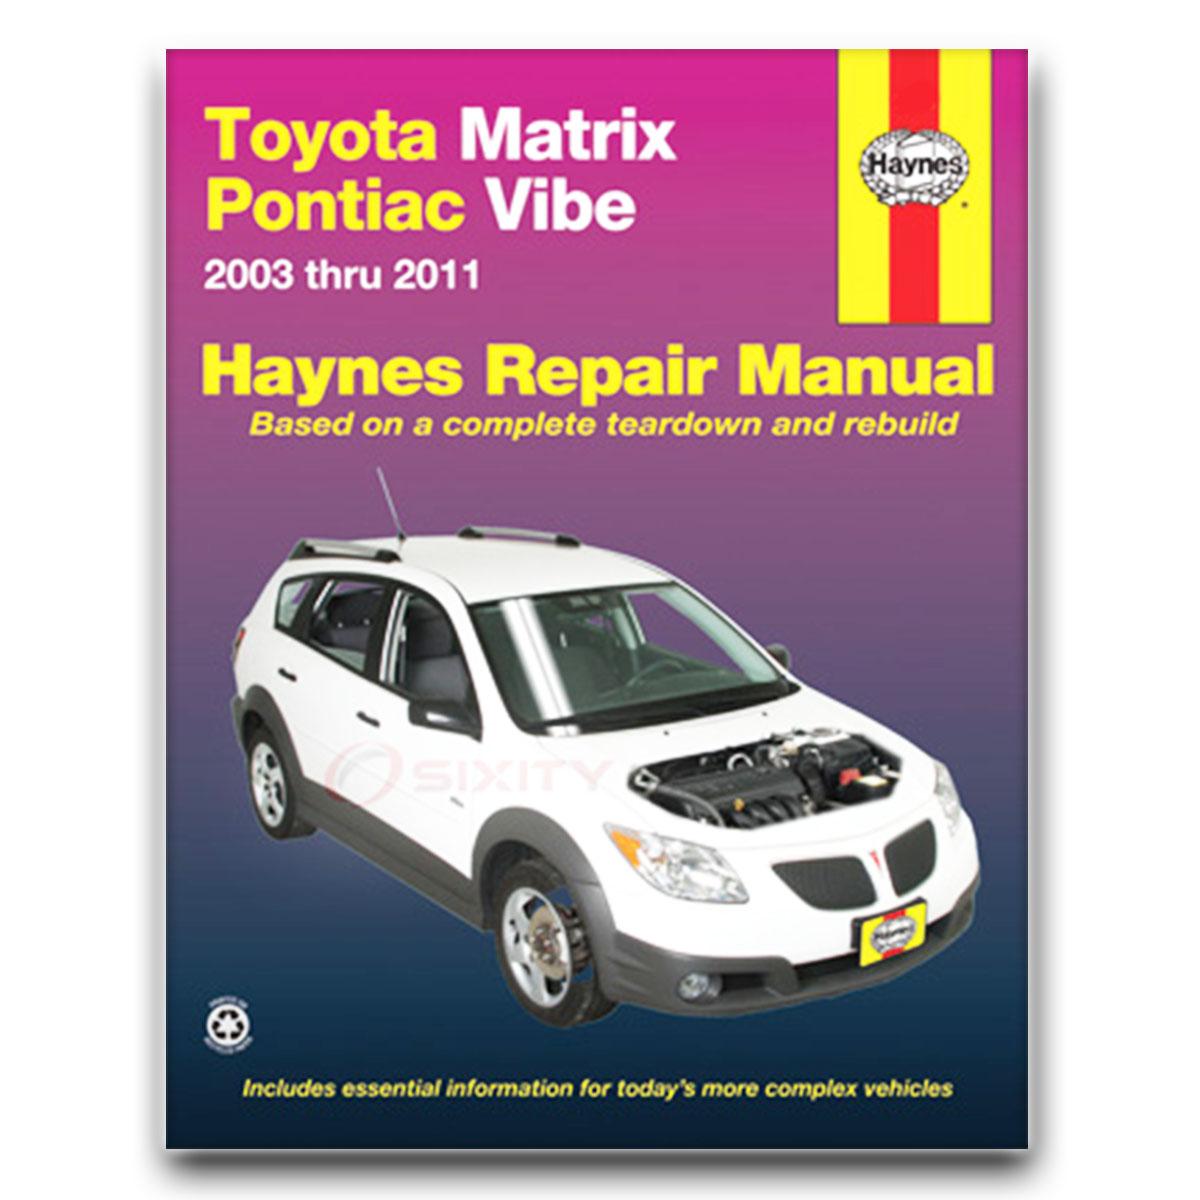 haynes toyota matrix pontiac vibe 03 11 repair manual 92060 shop rh ebay com Haynes Manual Monte Carlo Back haynes repair manual toyota matrix